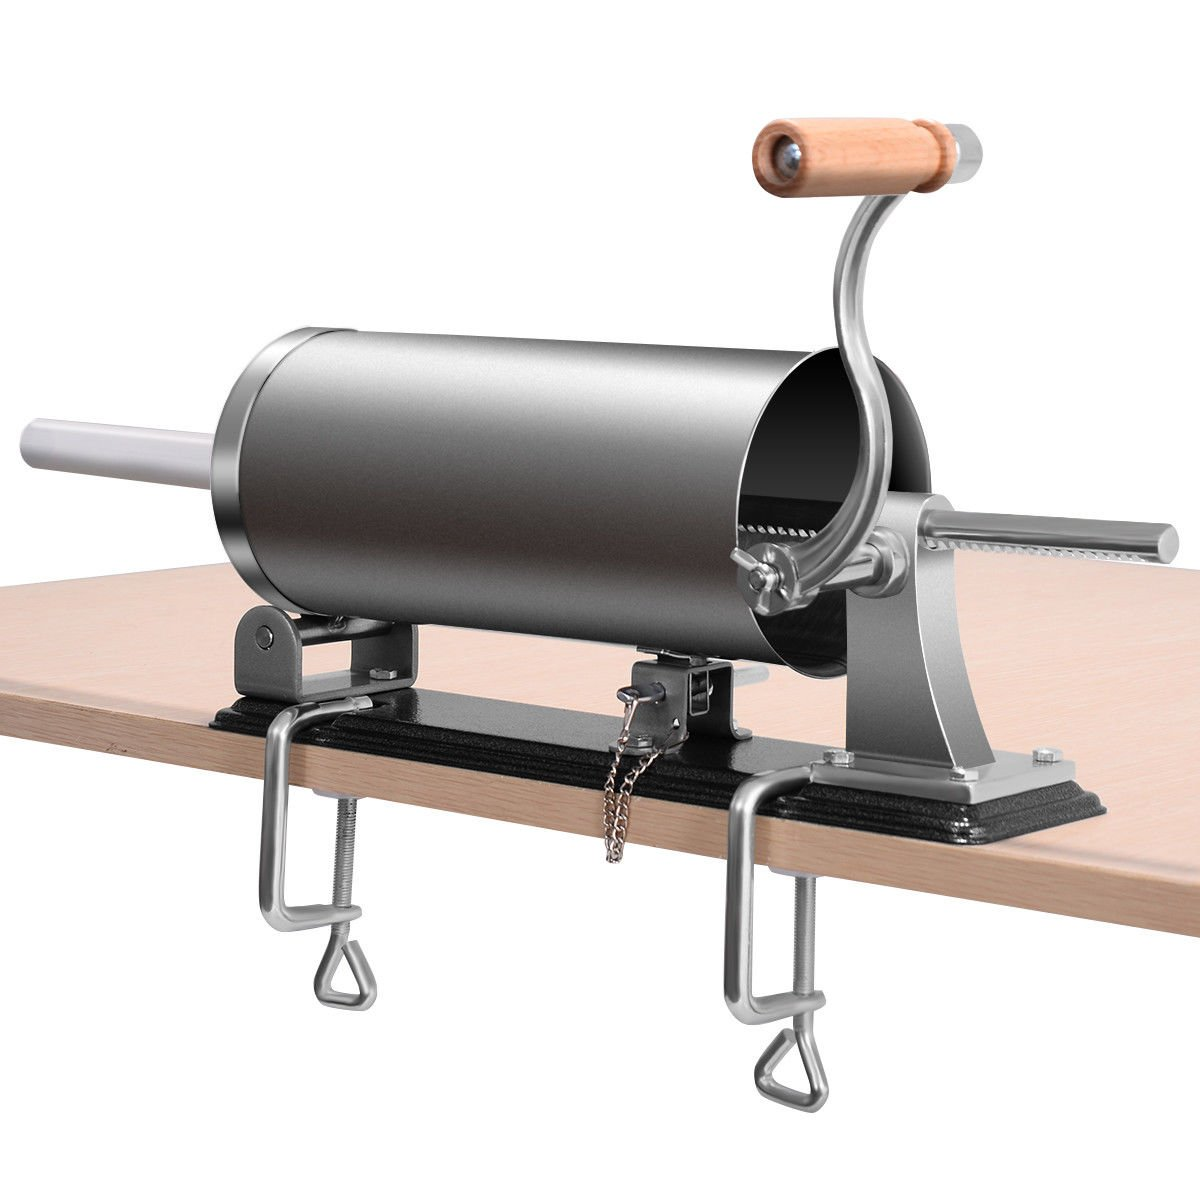 Goplus Horizontal Stainless Steel Sausage Stuffer Maker Meat Filler Kit Commercial (3.6L)